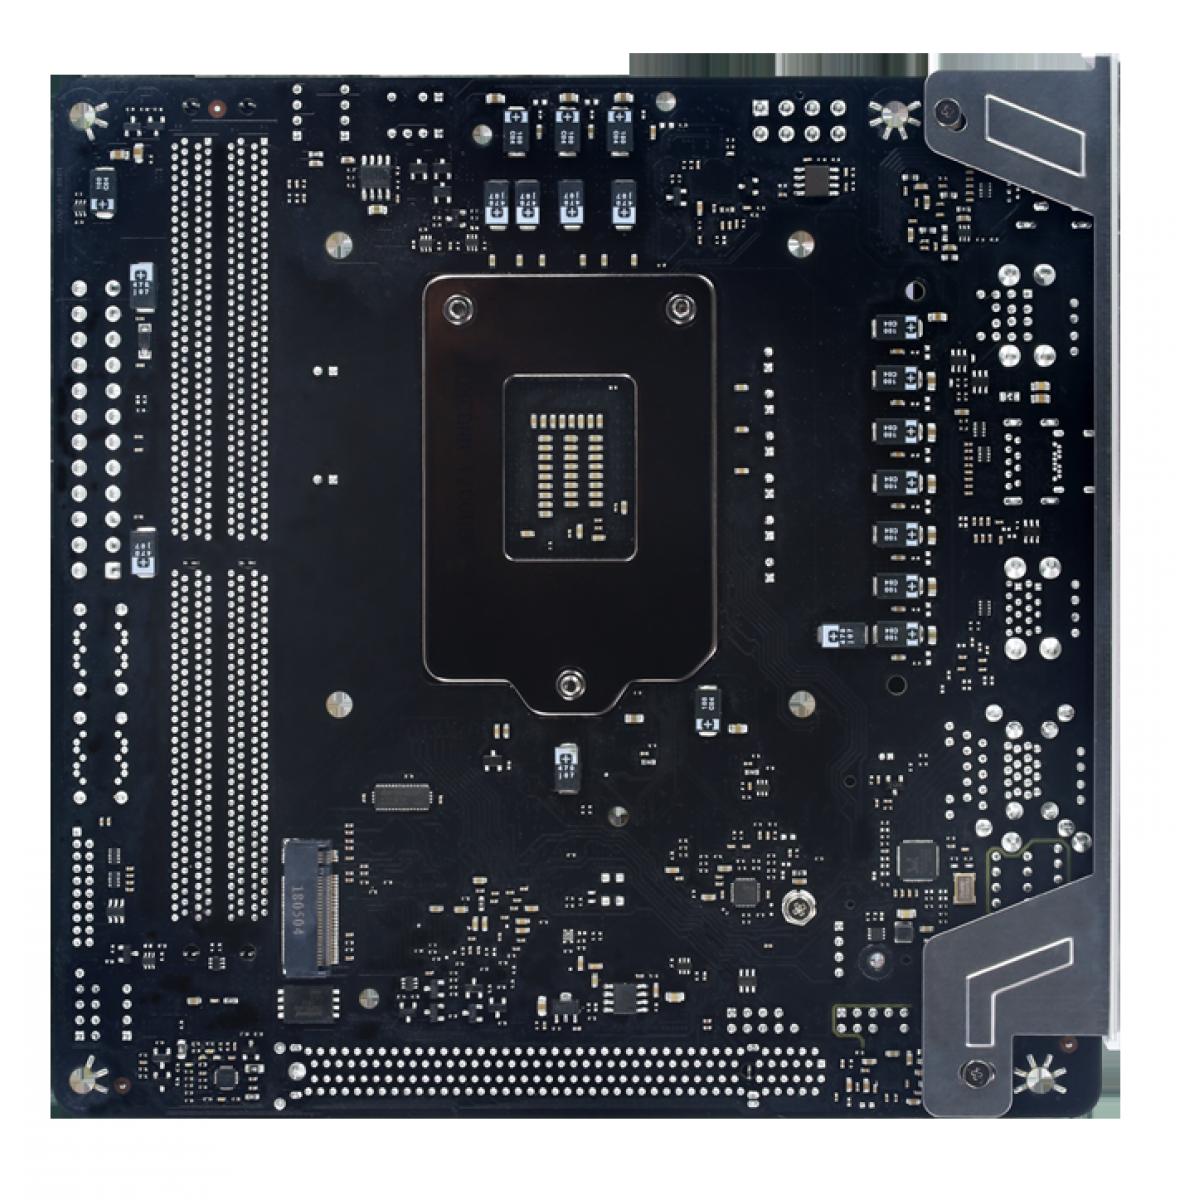 Placa Mãe BIOSTAR Z590I Valkyrie, Chipset Z590, Socket 1200, Mini ITX, DDR4